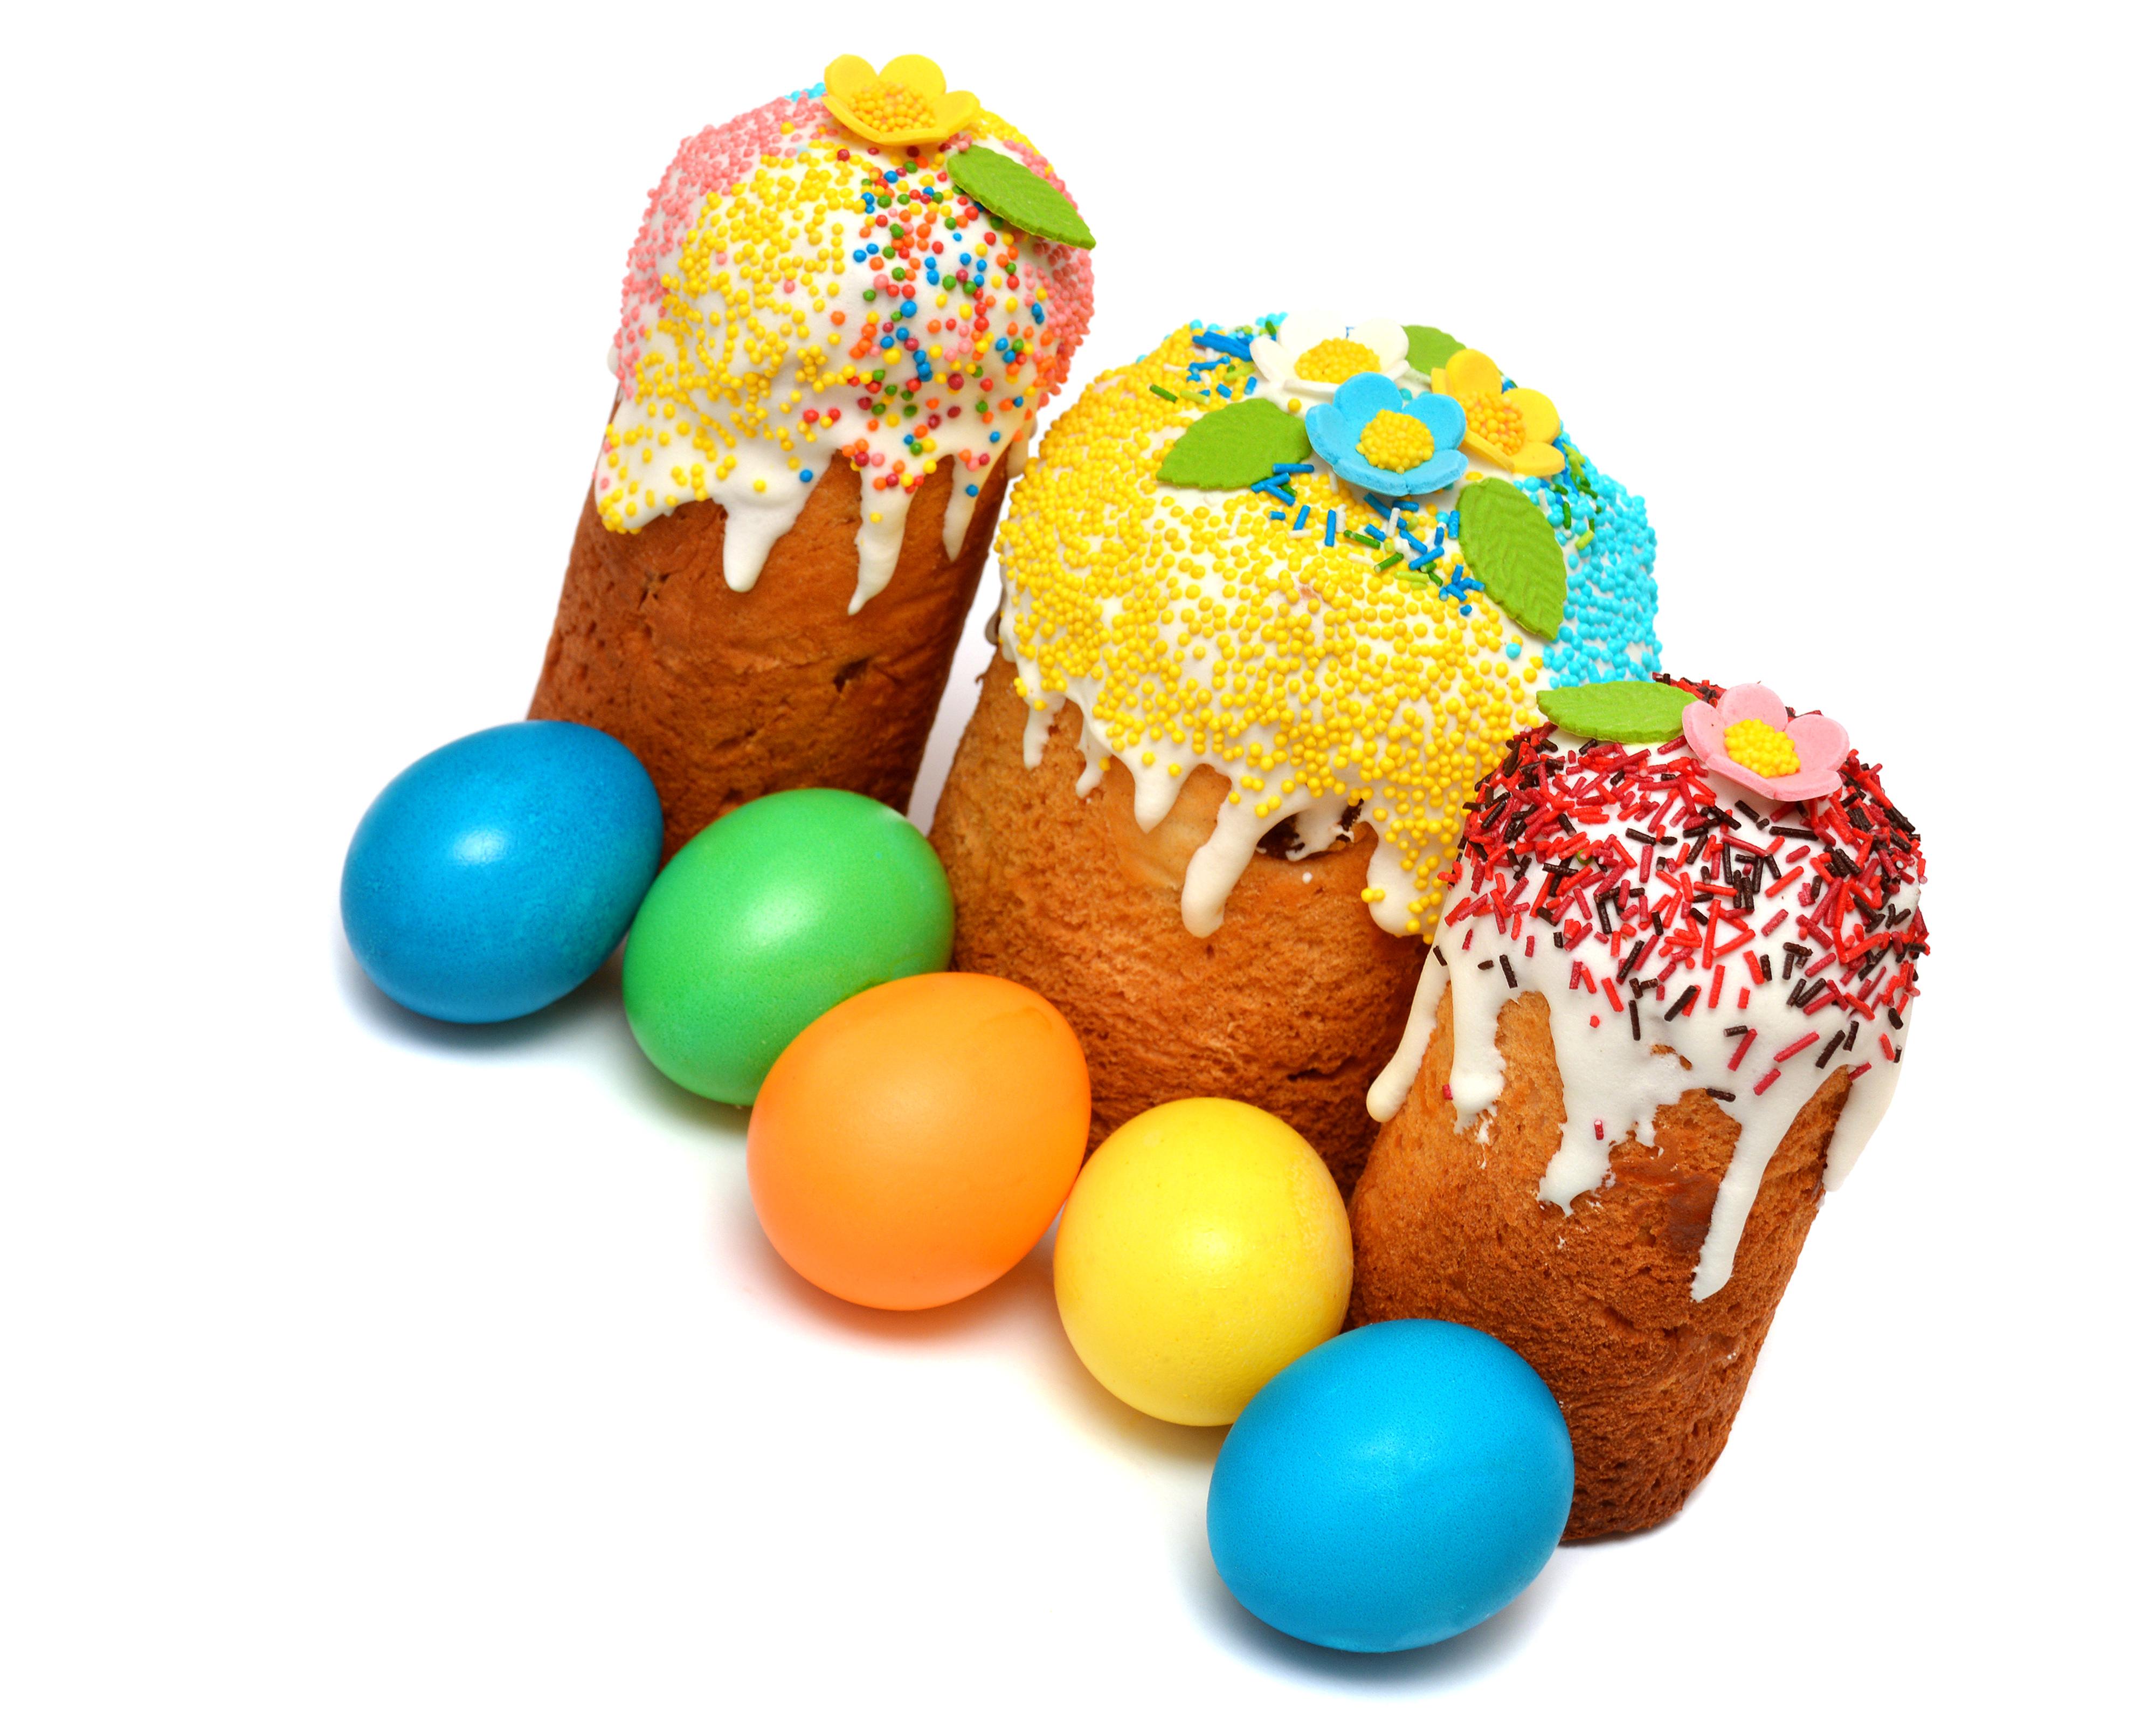 праздник пасха кулич яйца  № 2646791 без смс